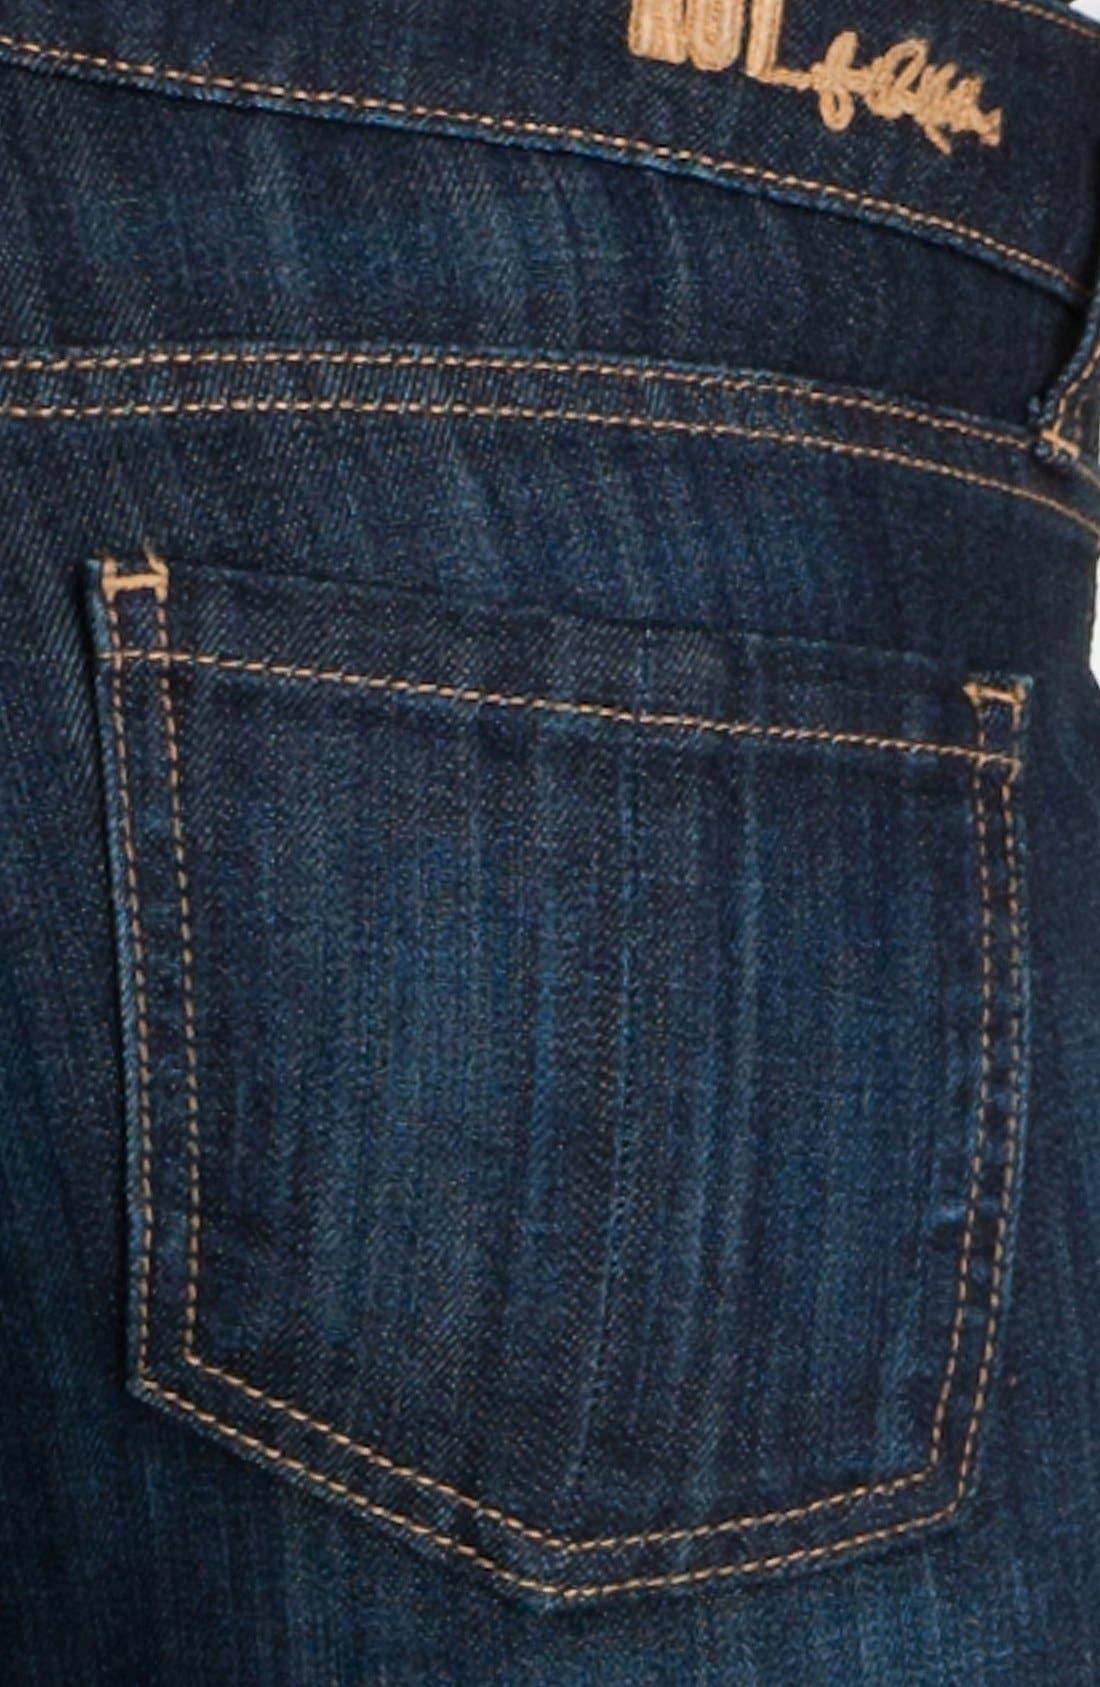 Alternate Image 3  - KUT from the Kloth 'Catherine' Slim Boyfriend Jeans (Royal) (Regular & Petite)